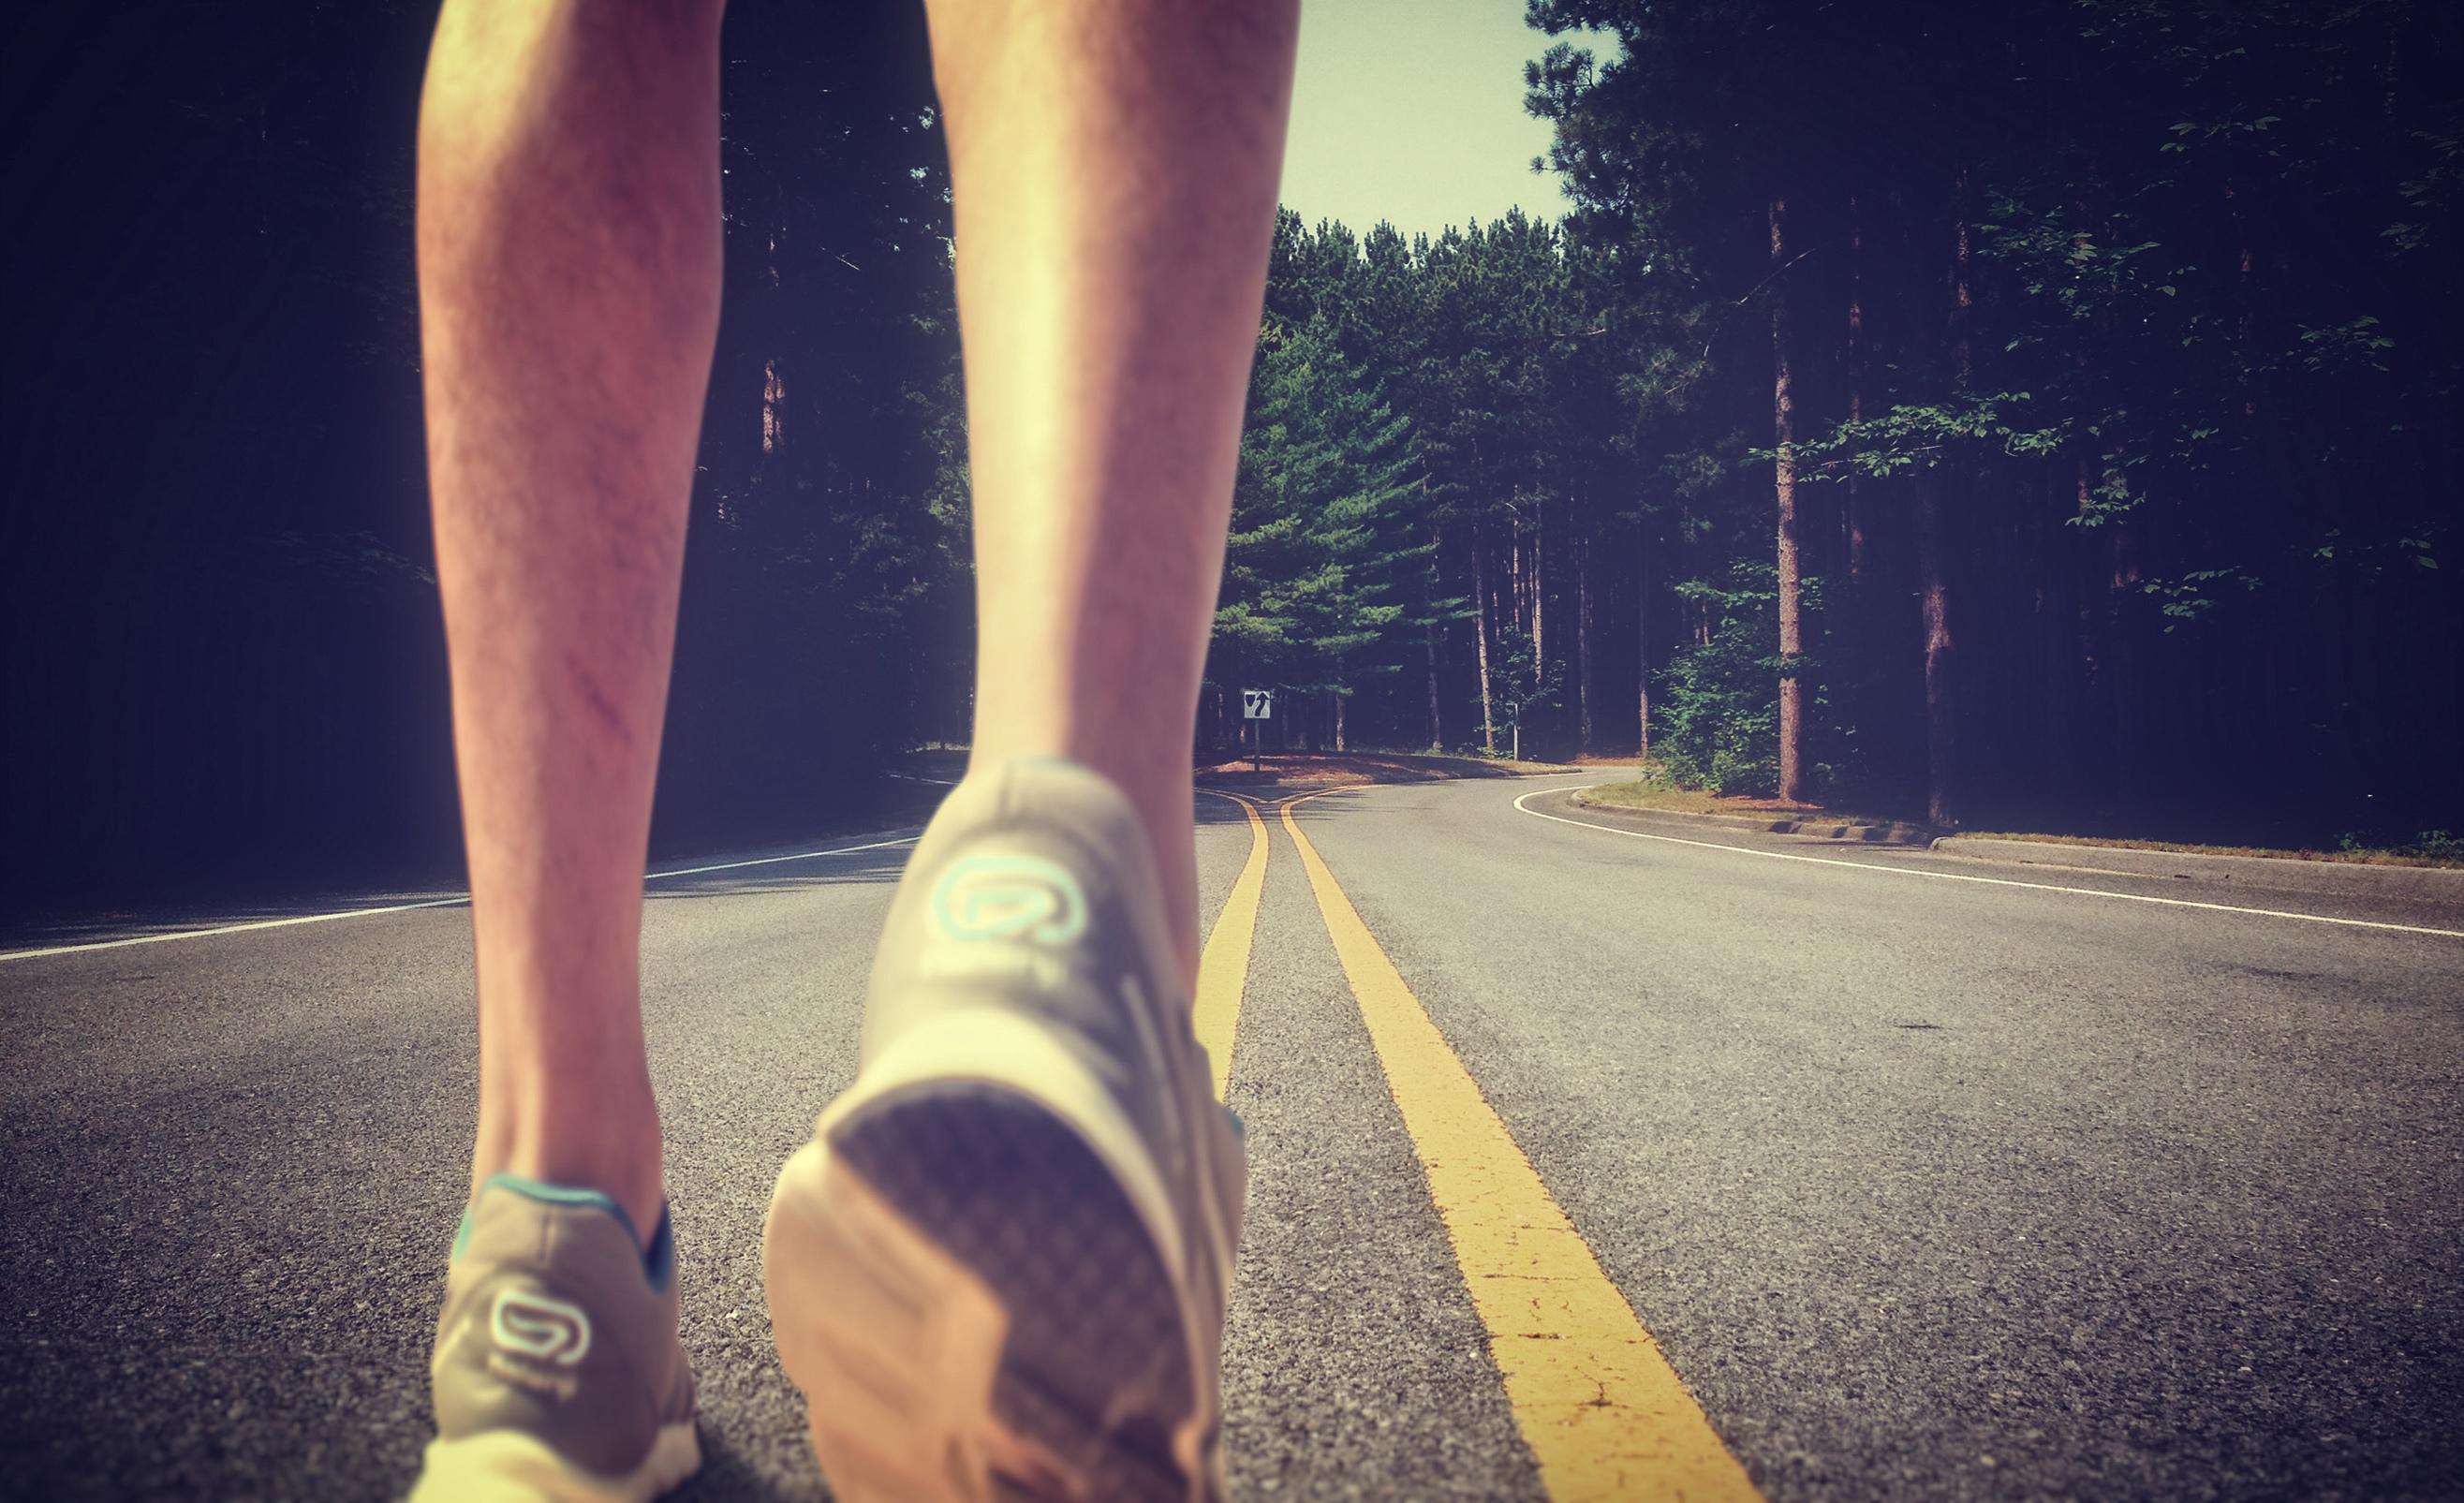 Stockvault feet of an athlete running on a deserted road179154